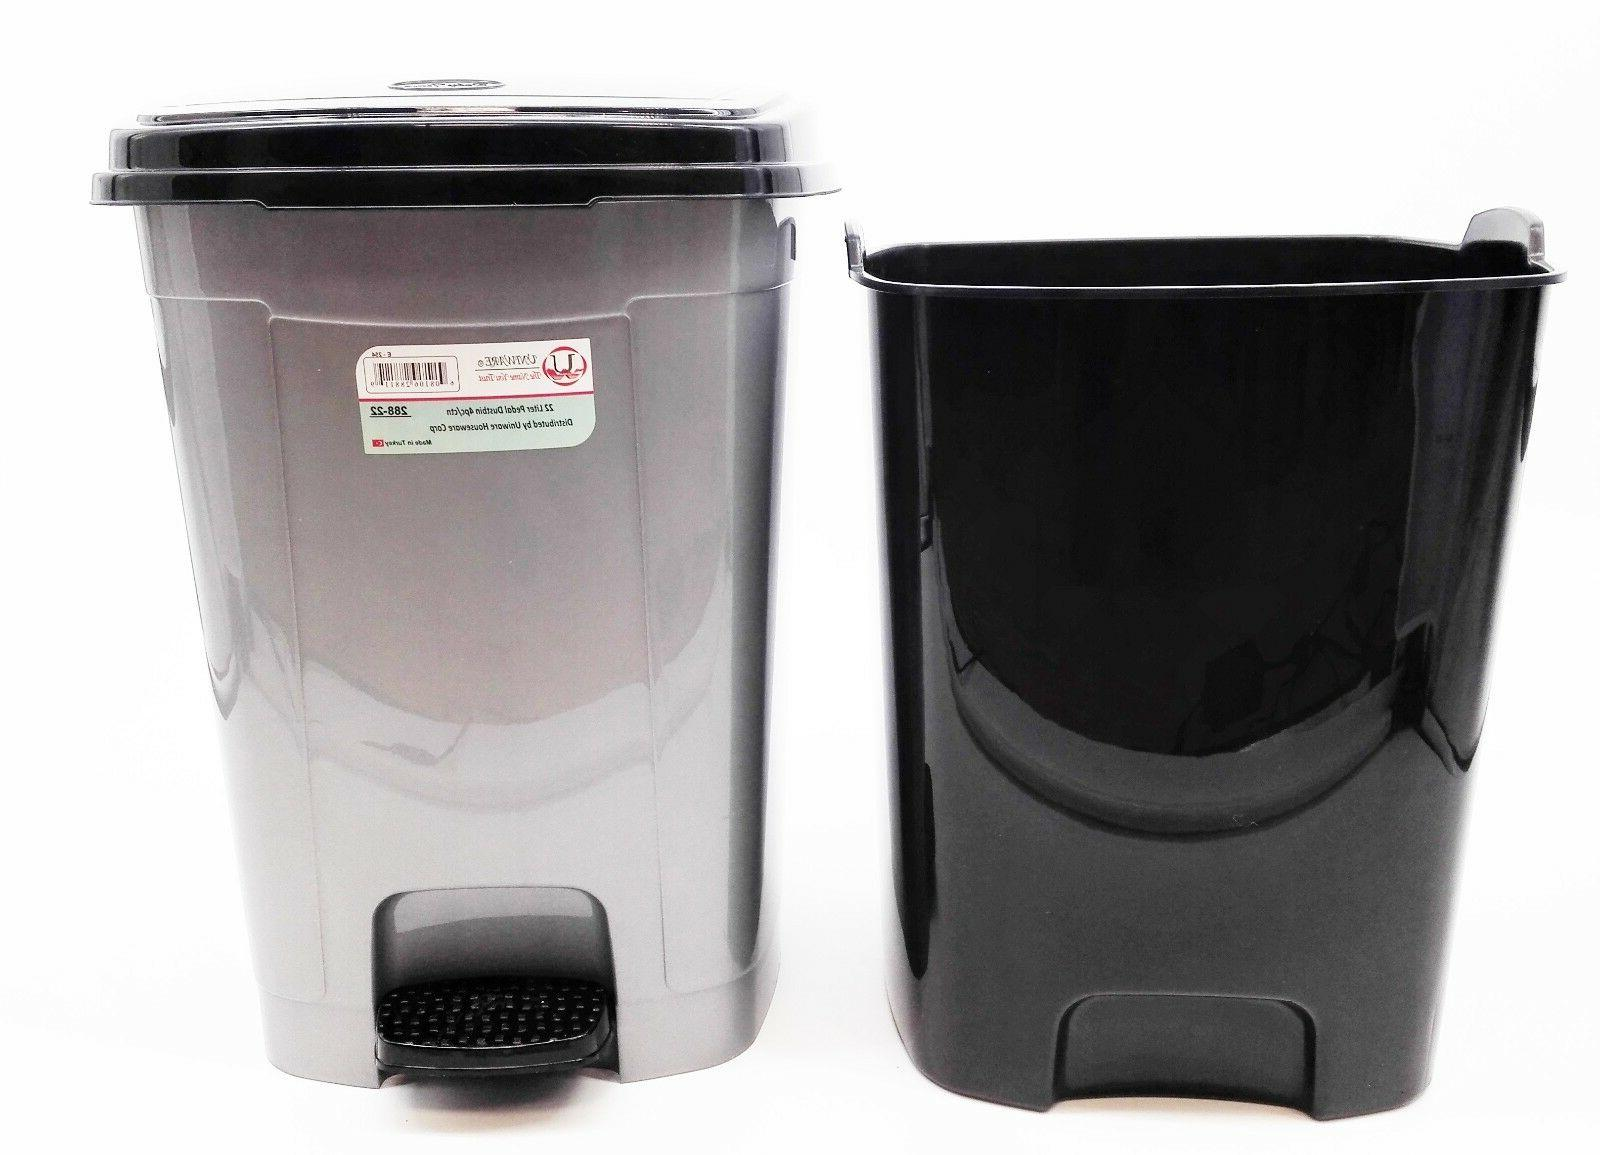 Pedal Dustbin Trash For Toilet Living Room,